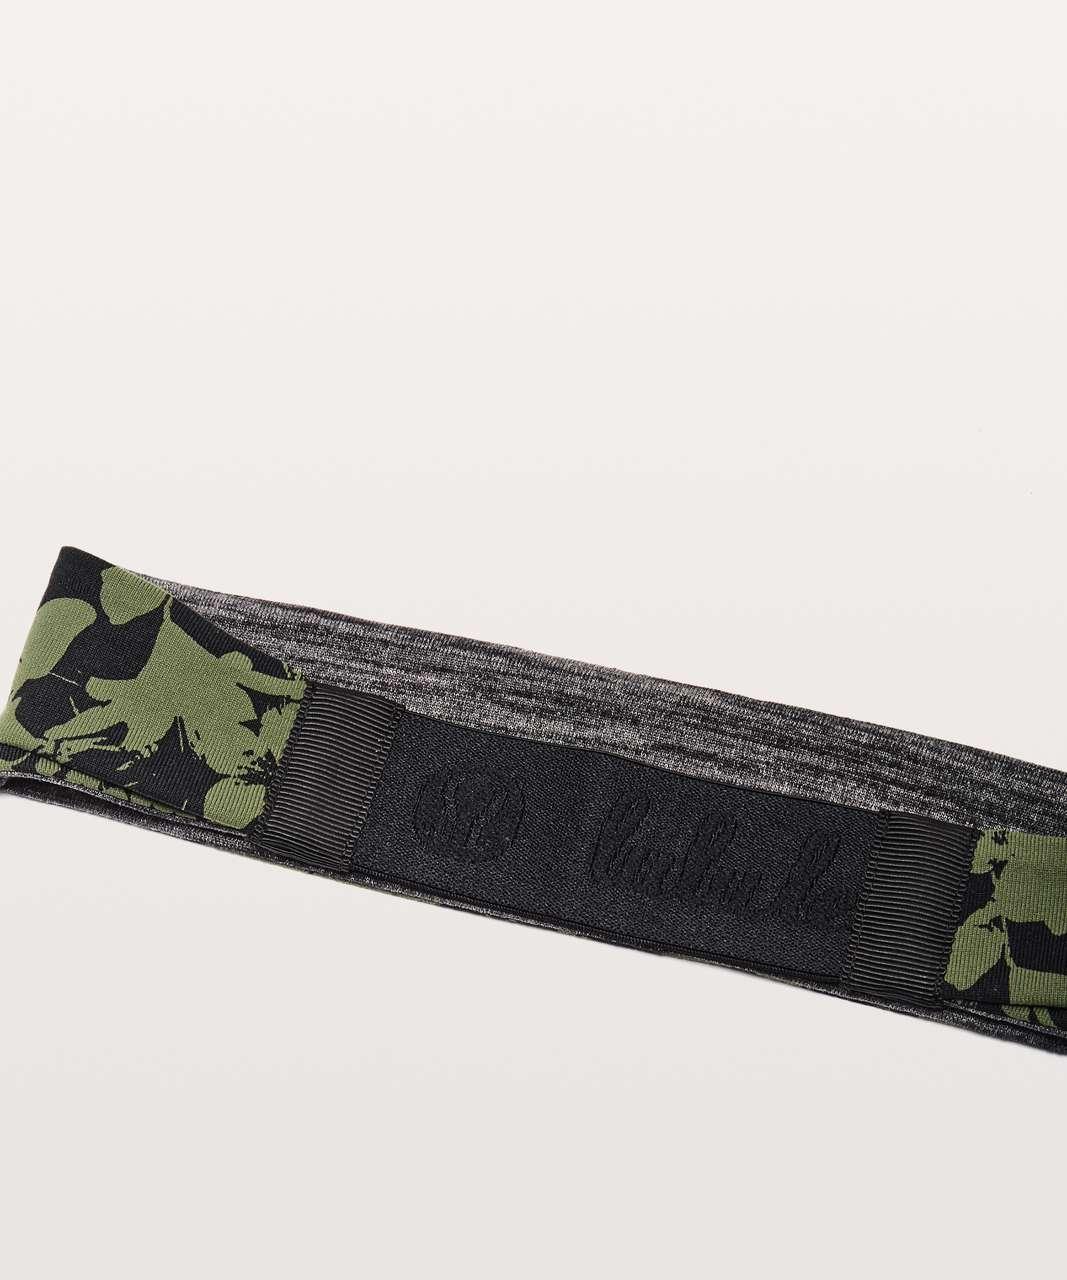 Lululemon Fringe Fighter Headband - Efflorescent Barracks Green Black / Heathered Black